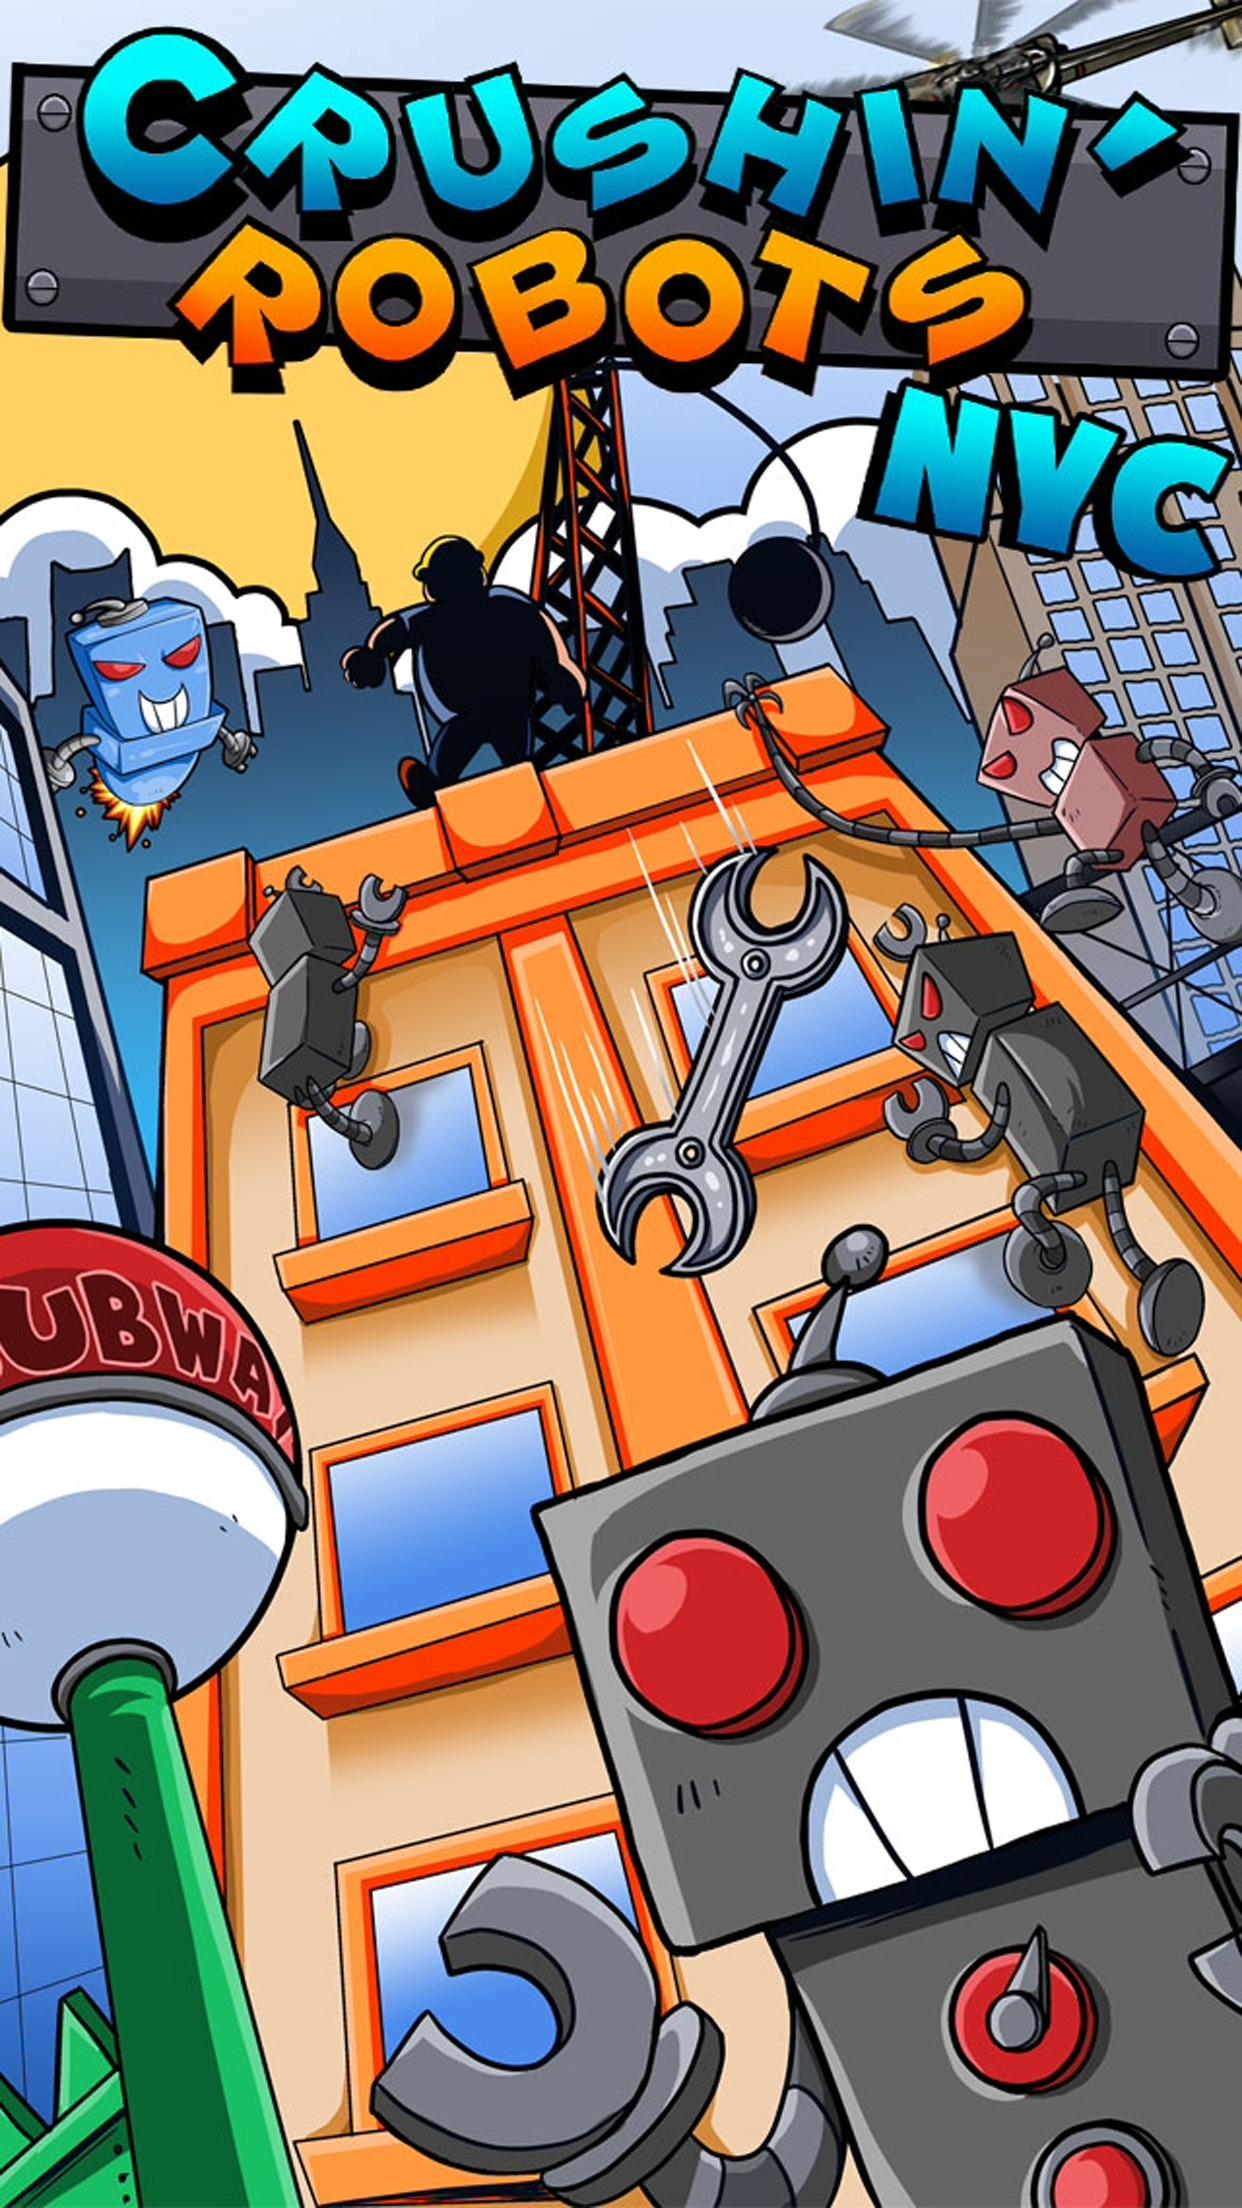 Crushin' Robots NYC - Robot City Defense! screenshot-4